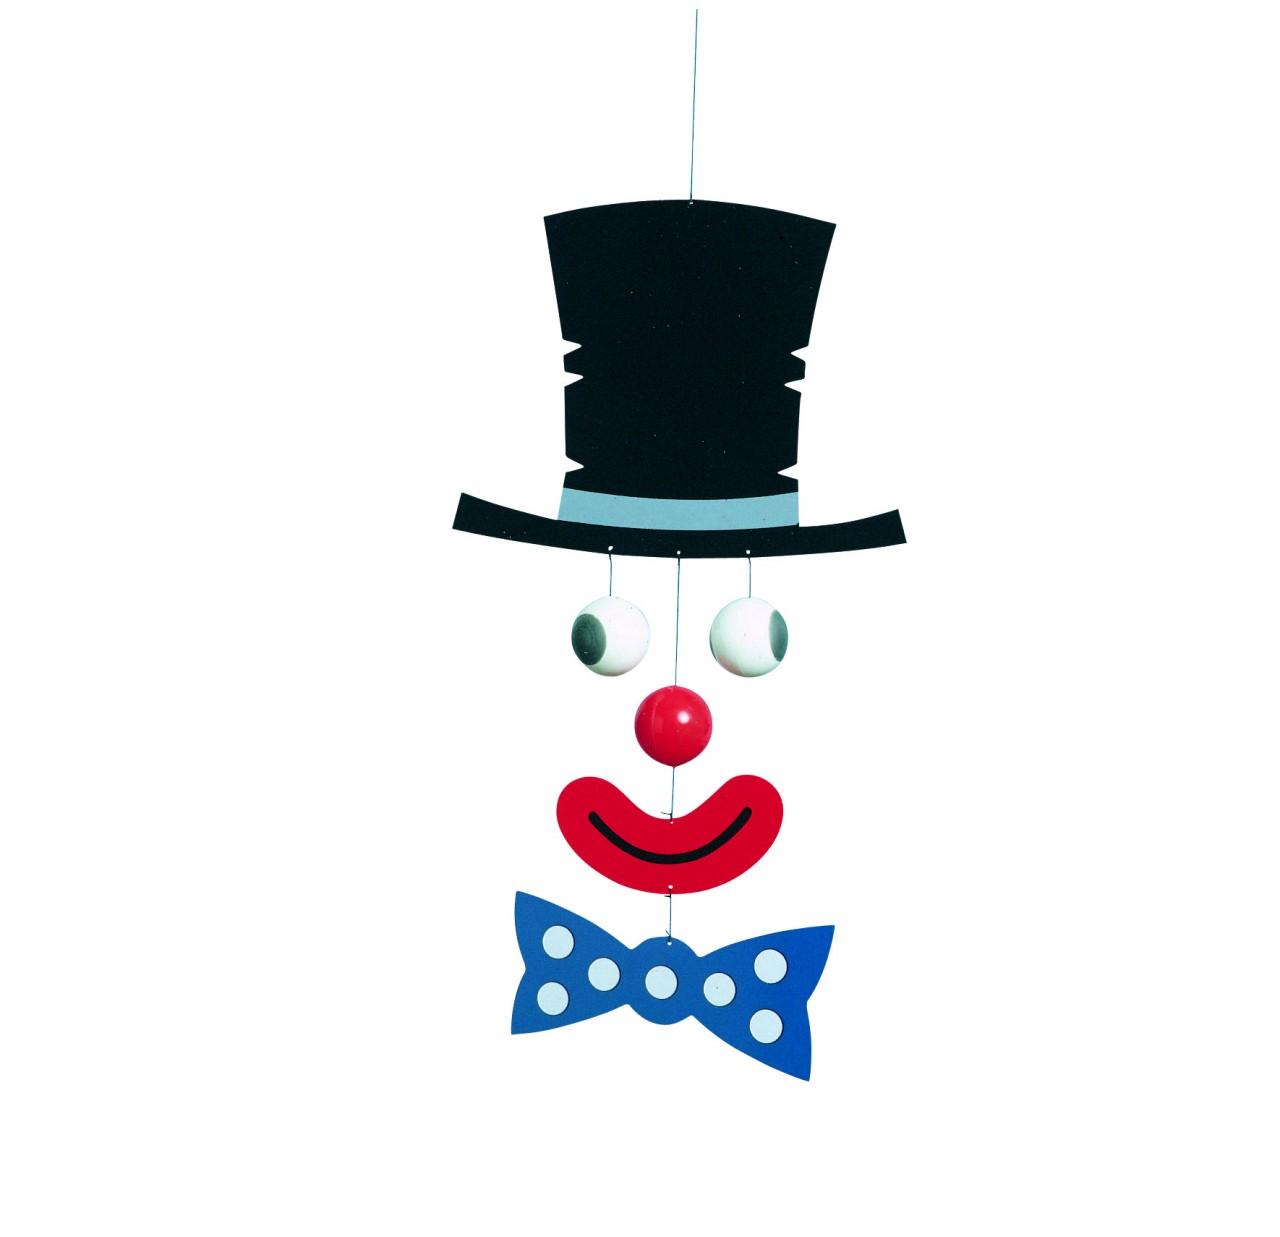 Flensted Bimmelim Clown Mobile